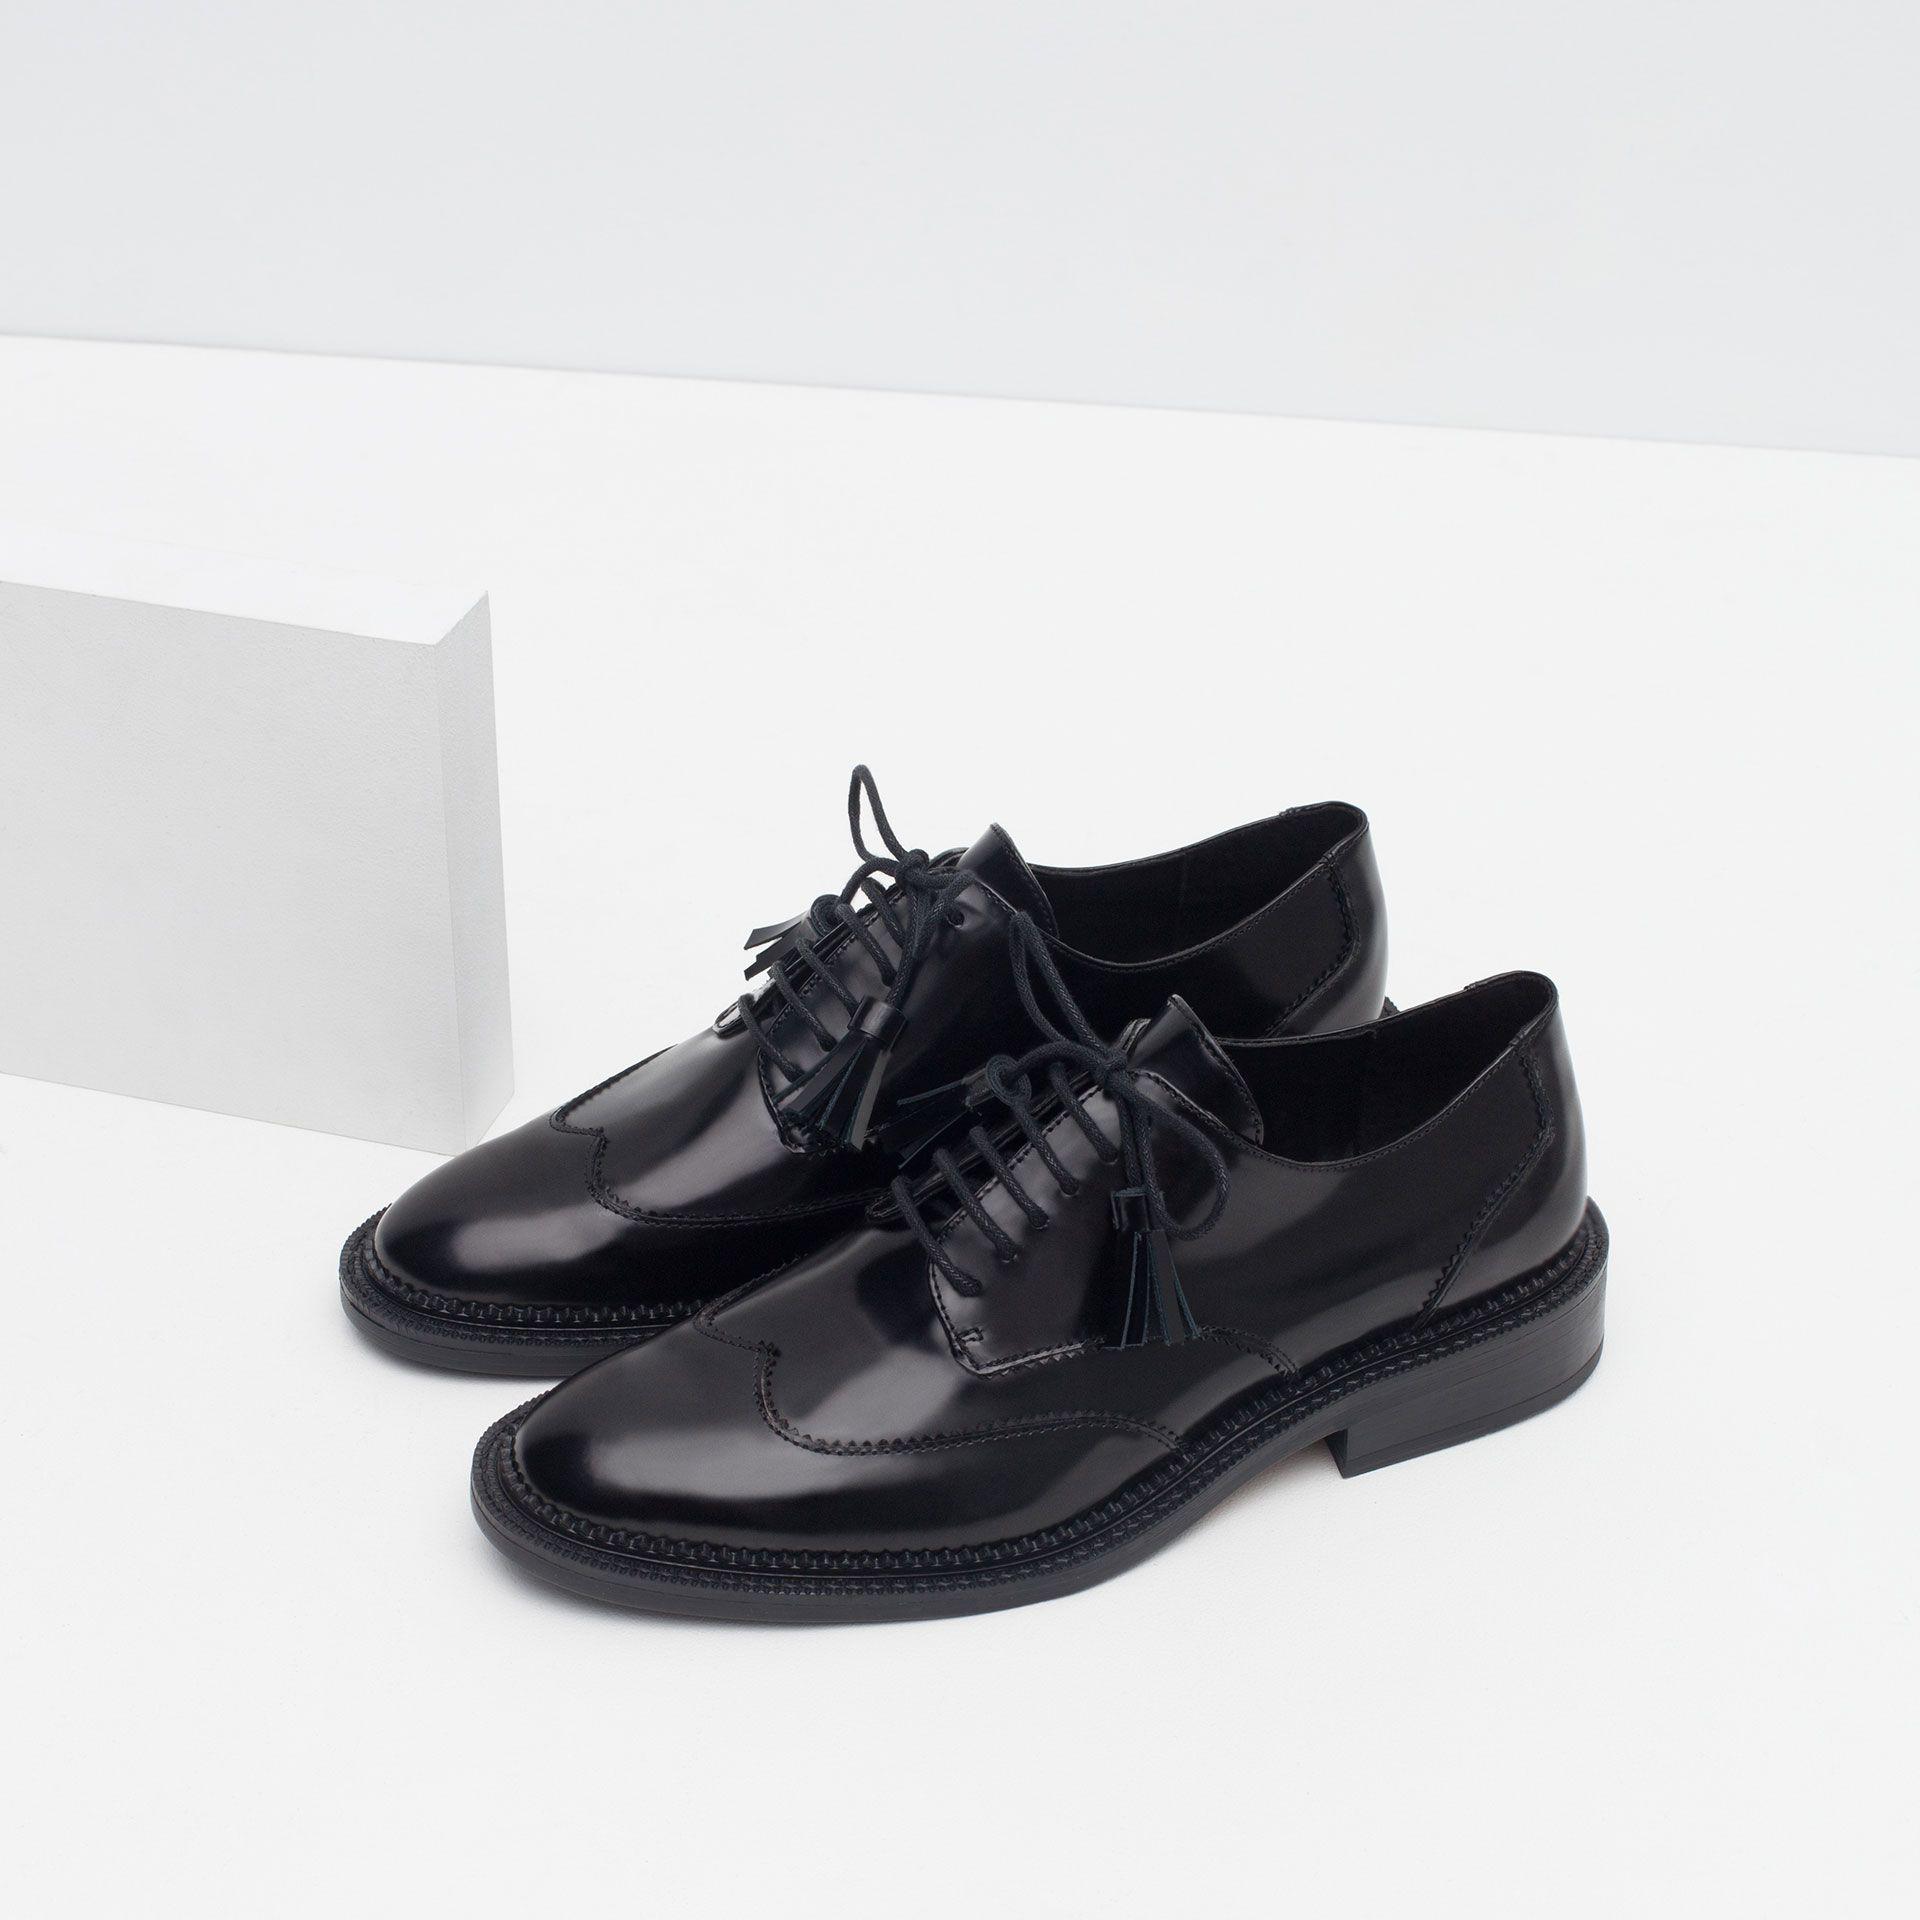 zara Homme Chaussures Chaussure Derby Bleu Daim Zara Man Cuir 1wf7Ox